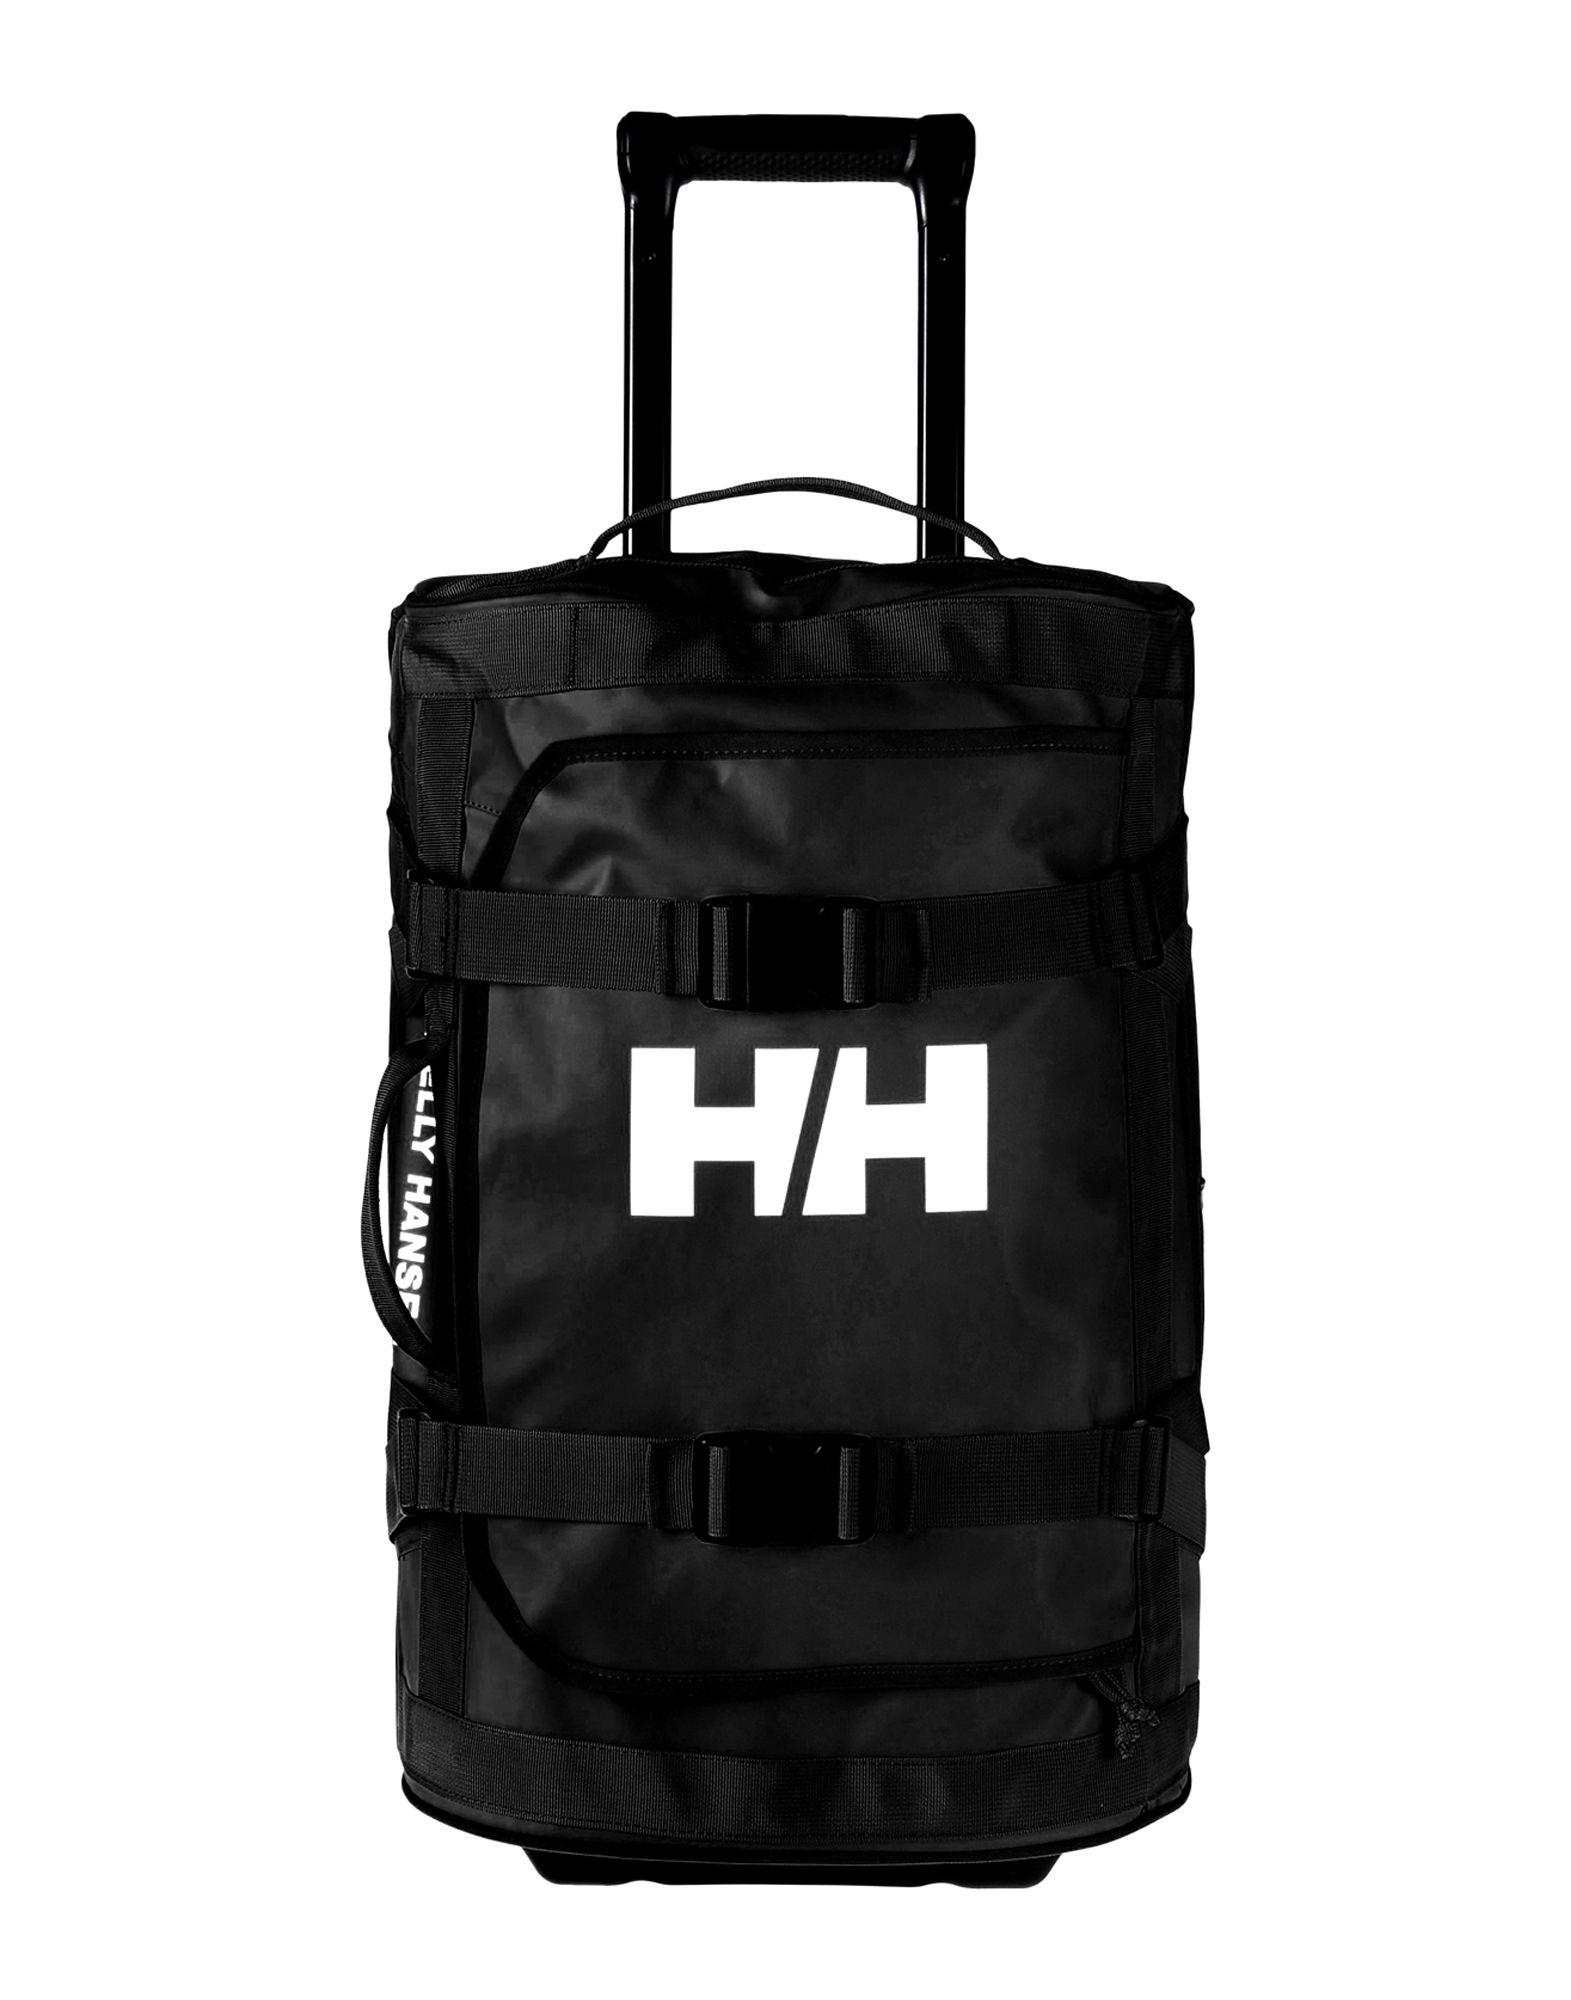 34ff62e998 Helly Hansen Wheeled Luggage in Black for Men - Lyst